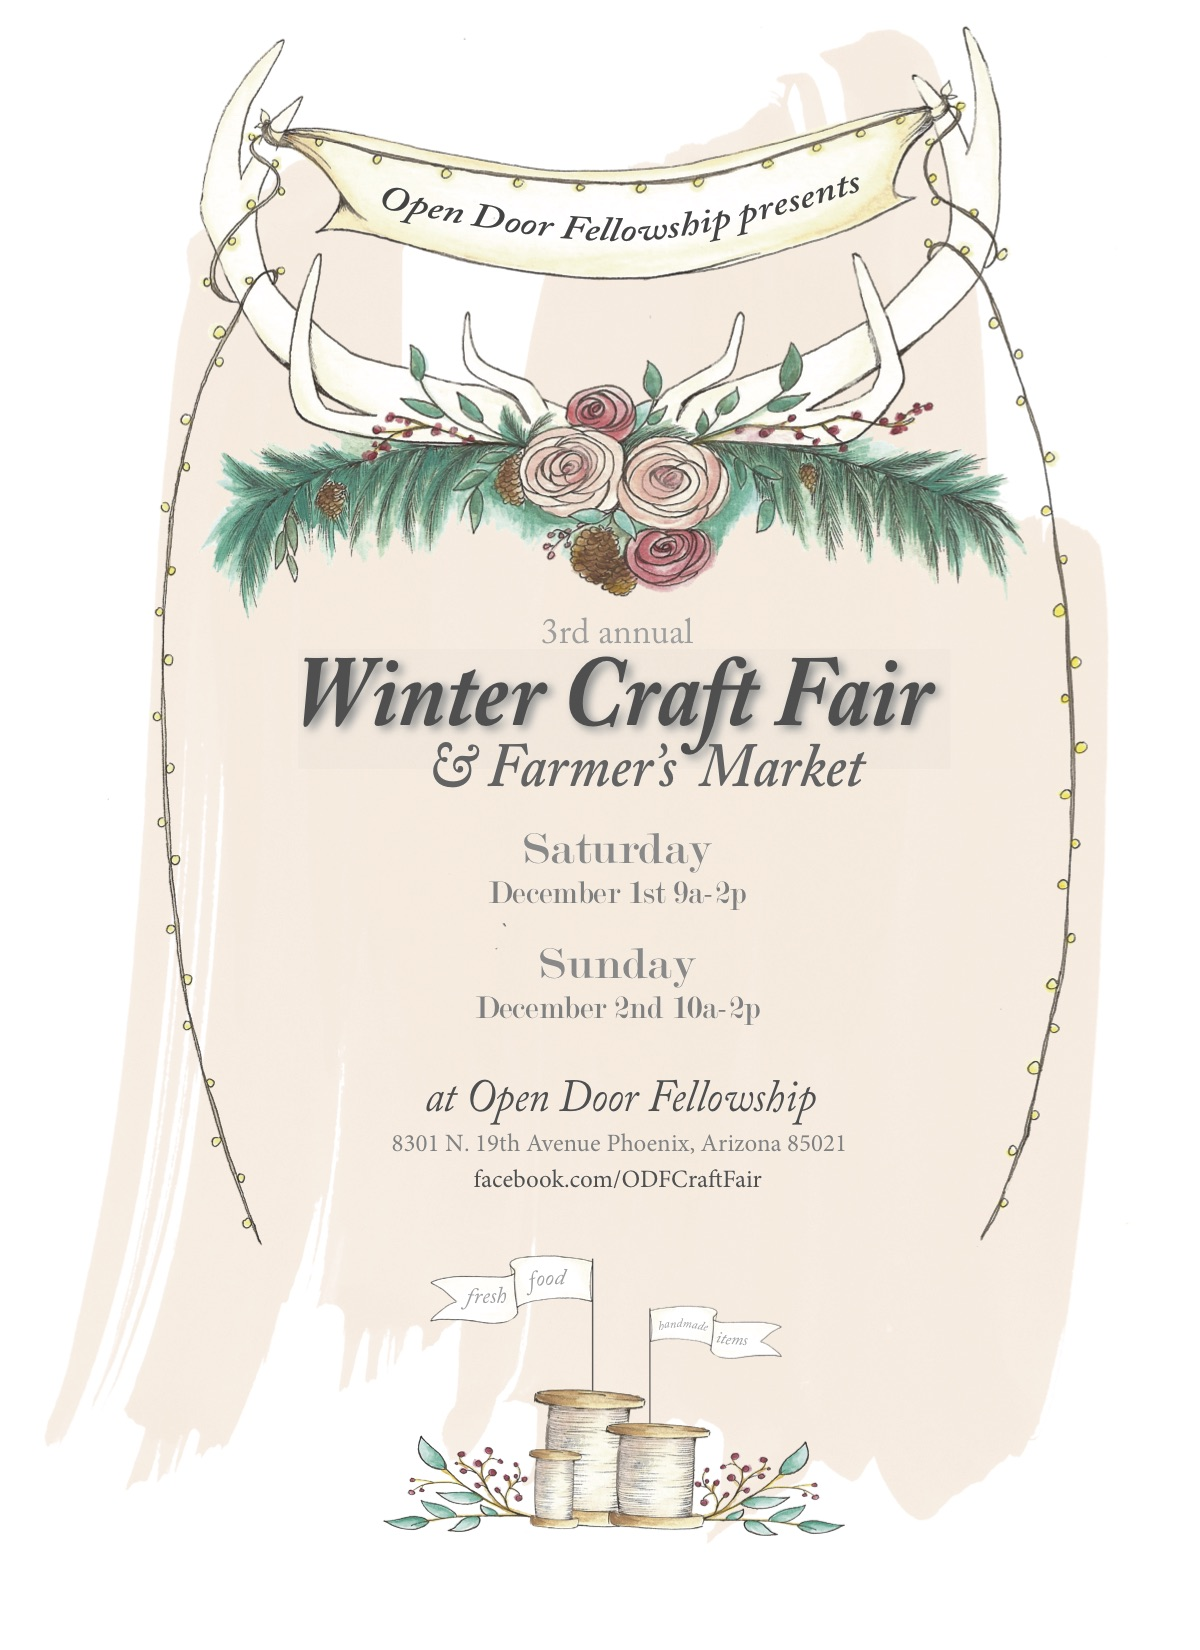 Craft Fair Flyer copy.jpg